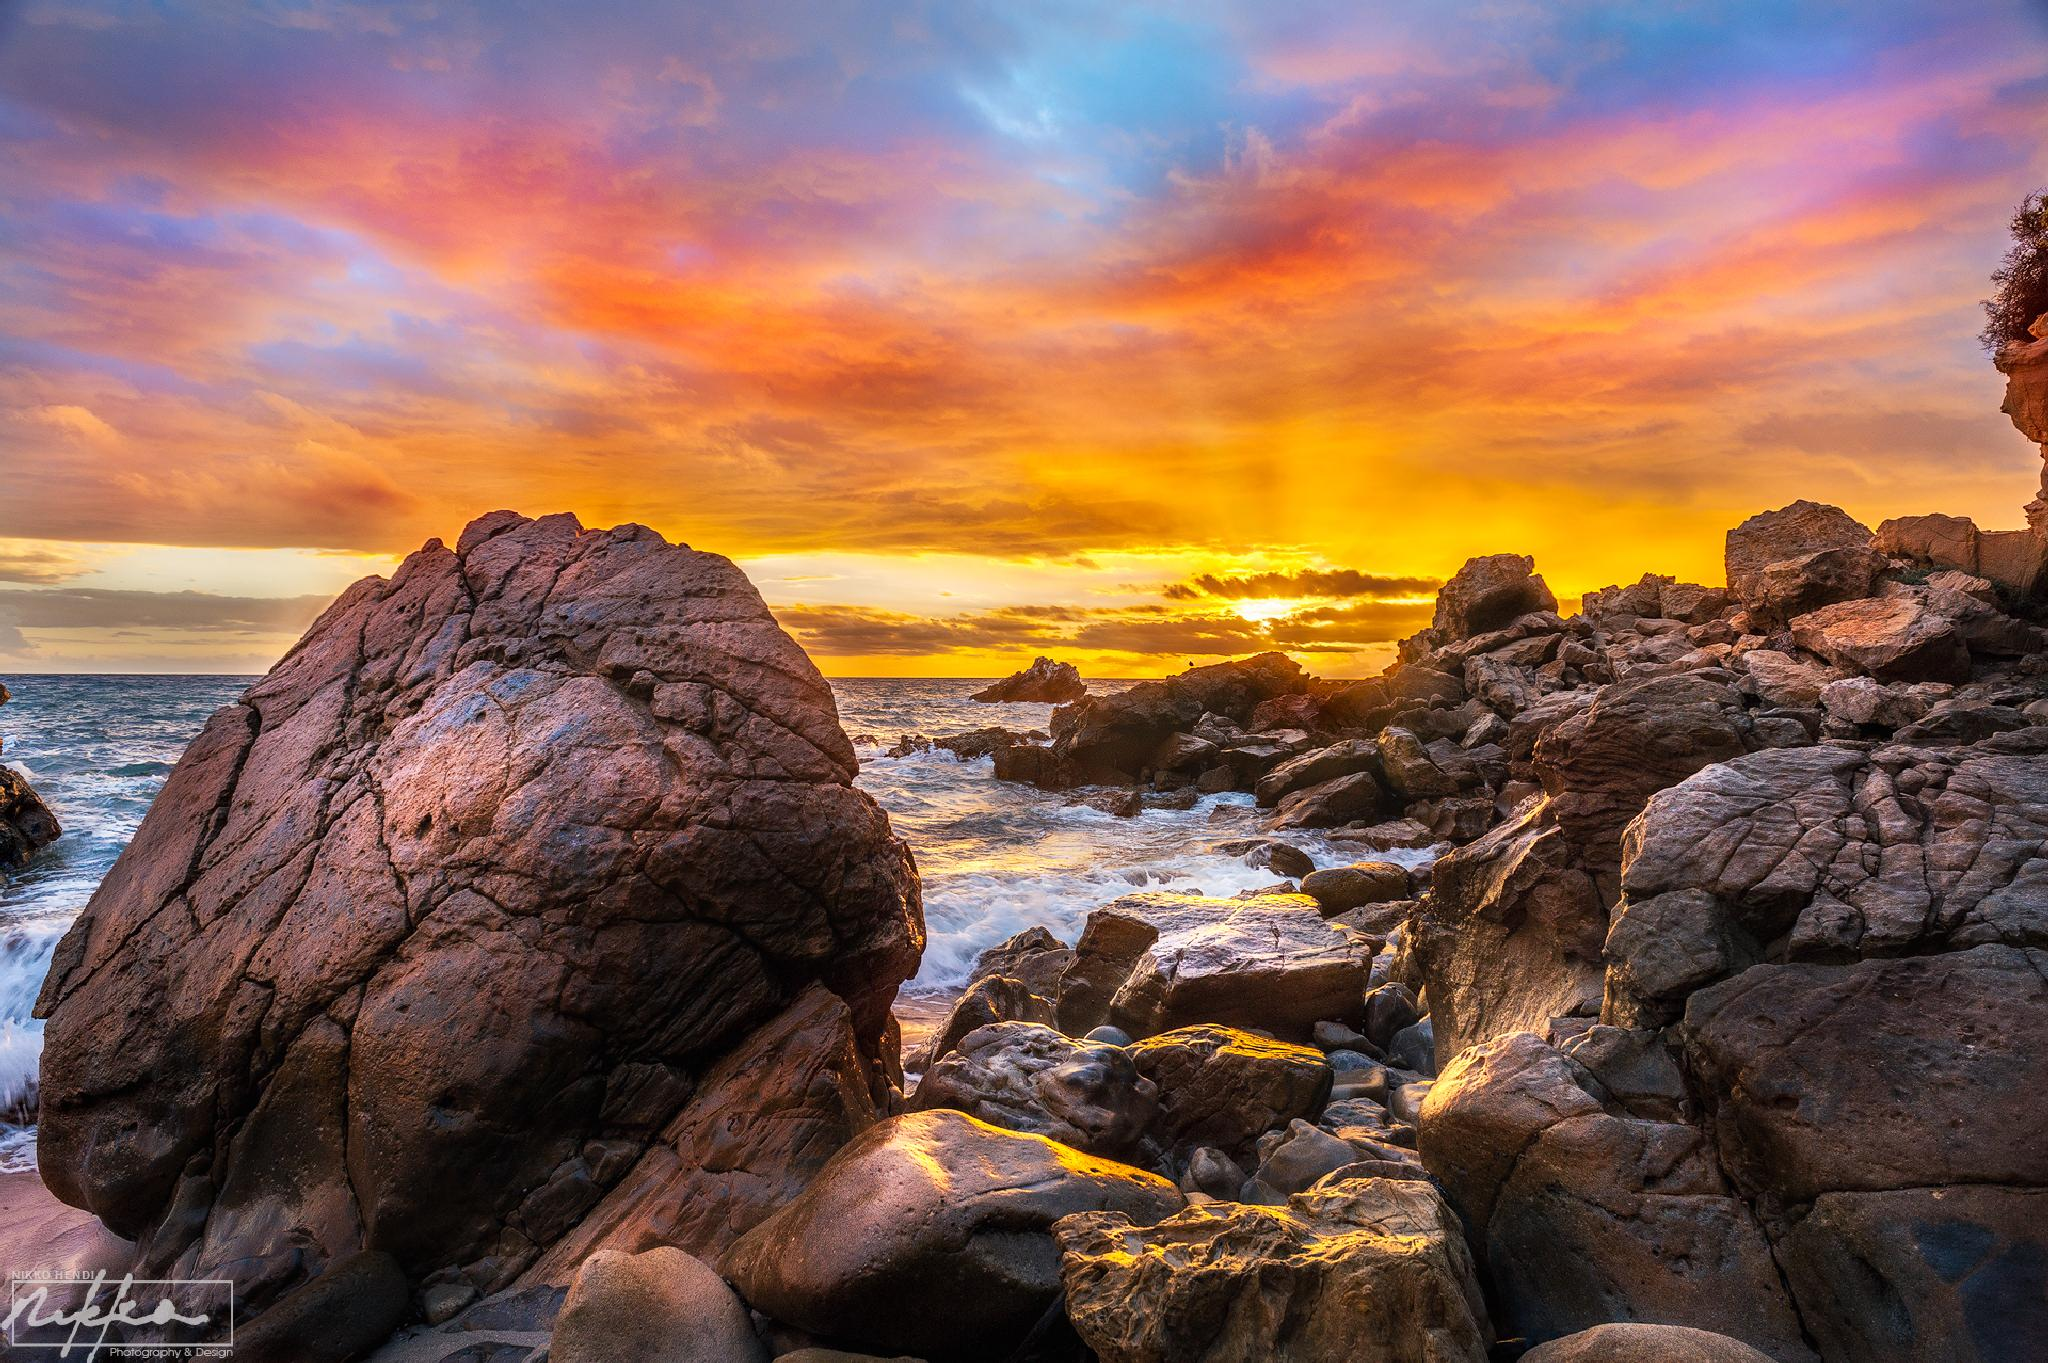 Sunset in Southern California - Nikko Hendi by Nikko Hendi